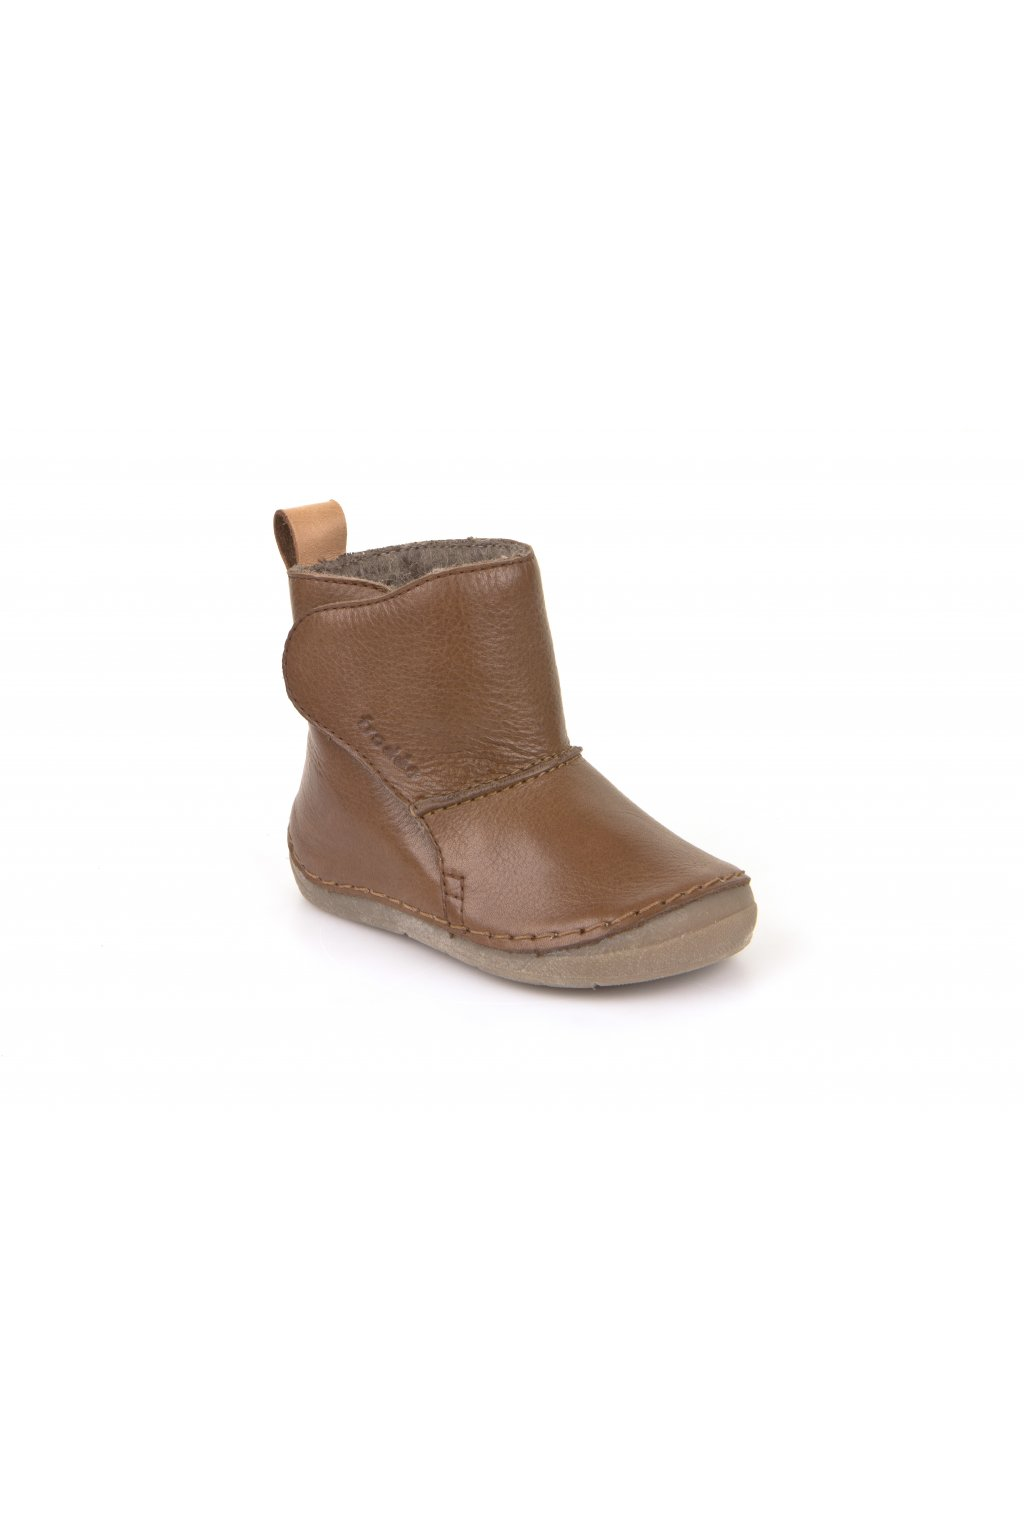 Froddo Boots Brown -Jahňacia Kožušina